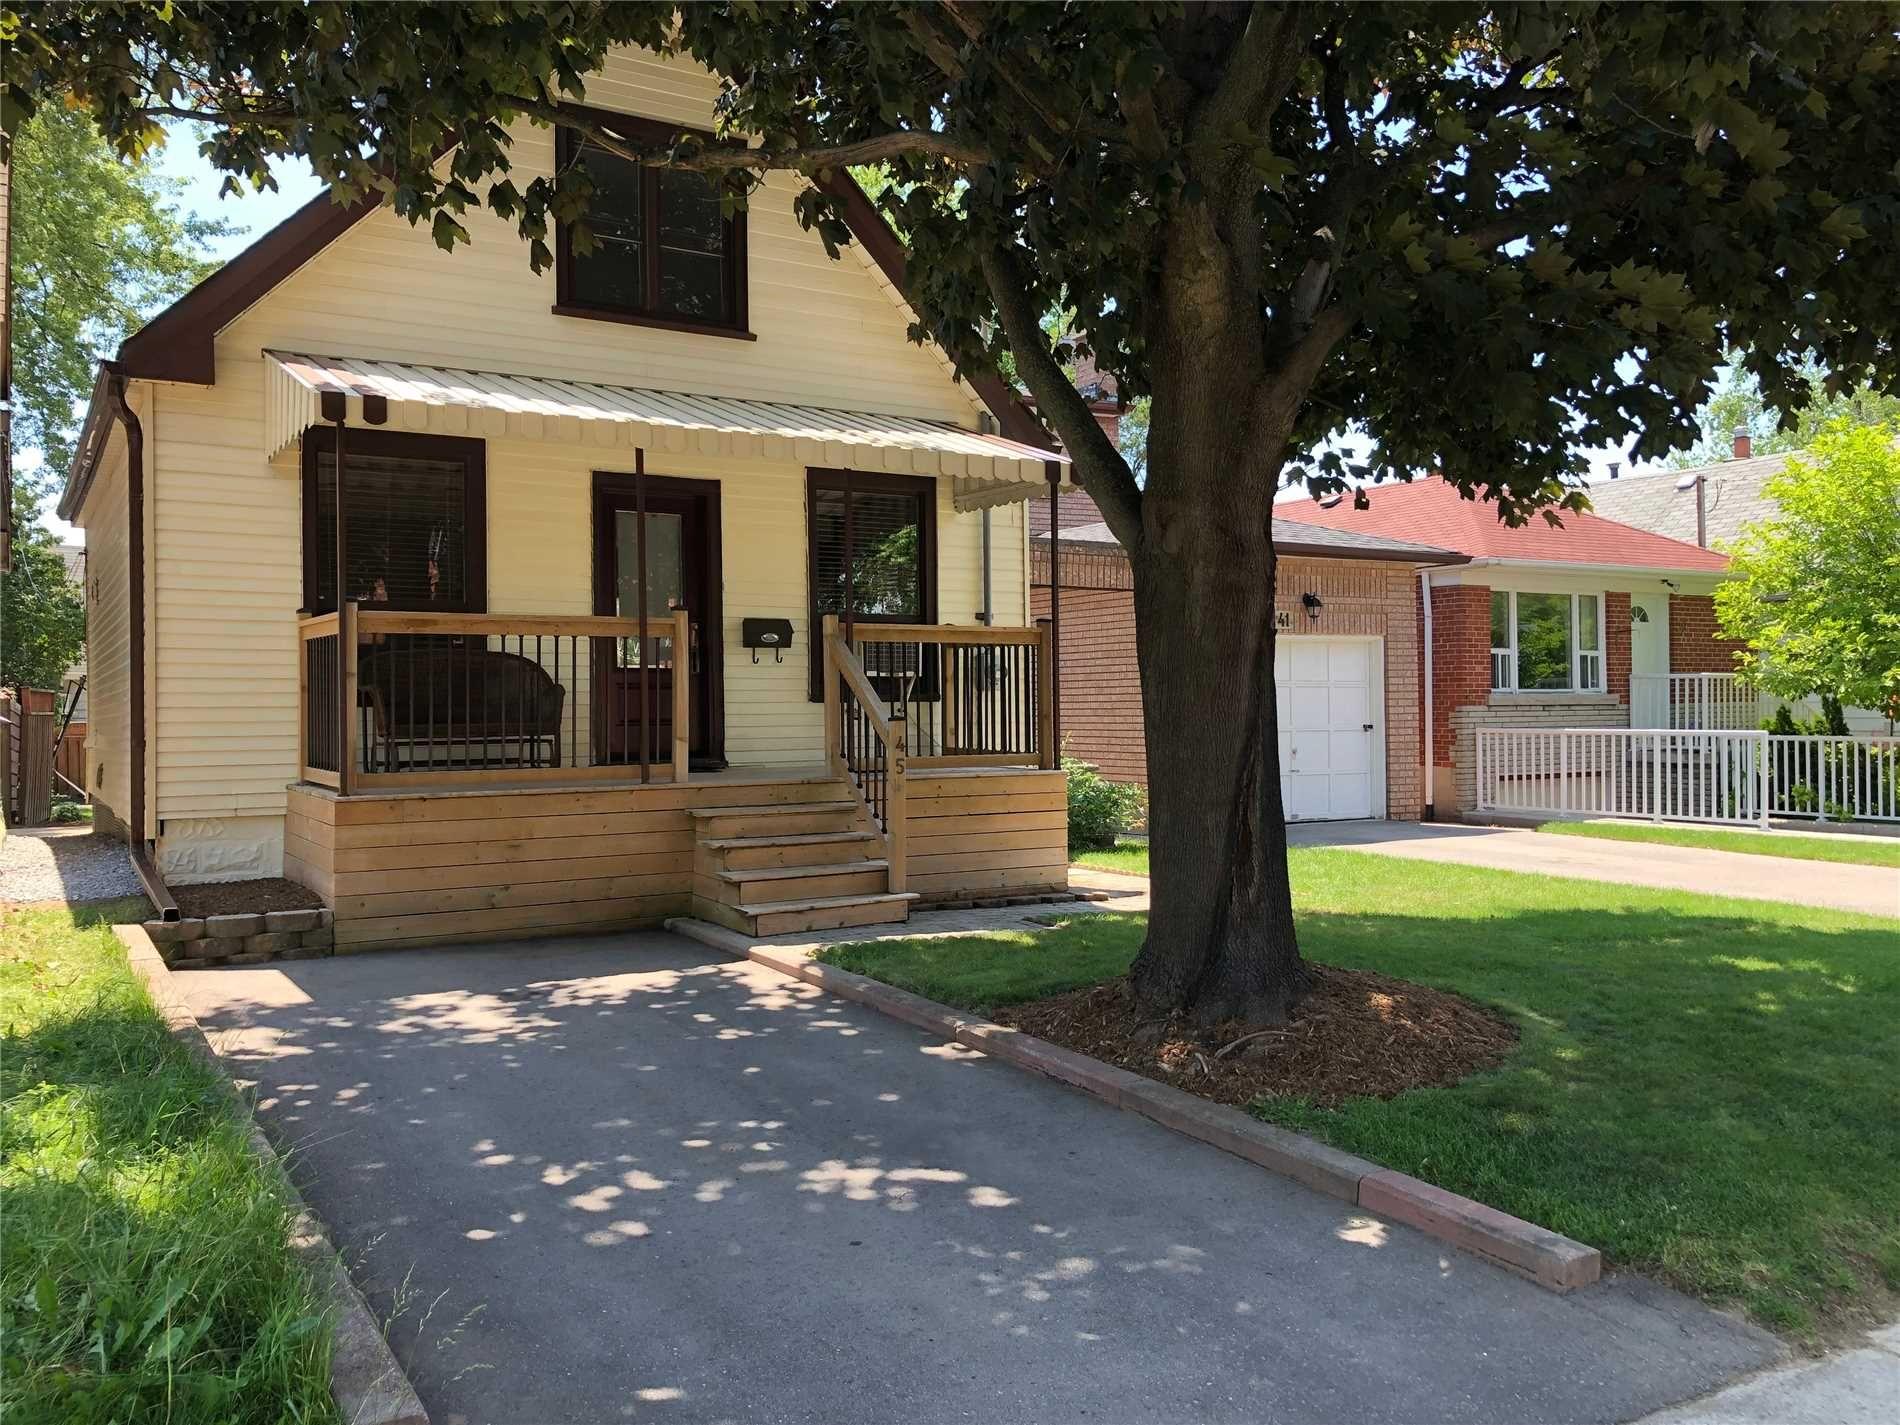 Main Photo: 45 E Highview Avenue in Toronto: Birchcliffe-Cliffside House (1 1/2 Storey) for sale (Toronto E06)  : MLS®# E4510937